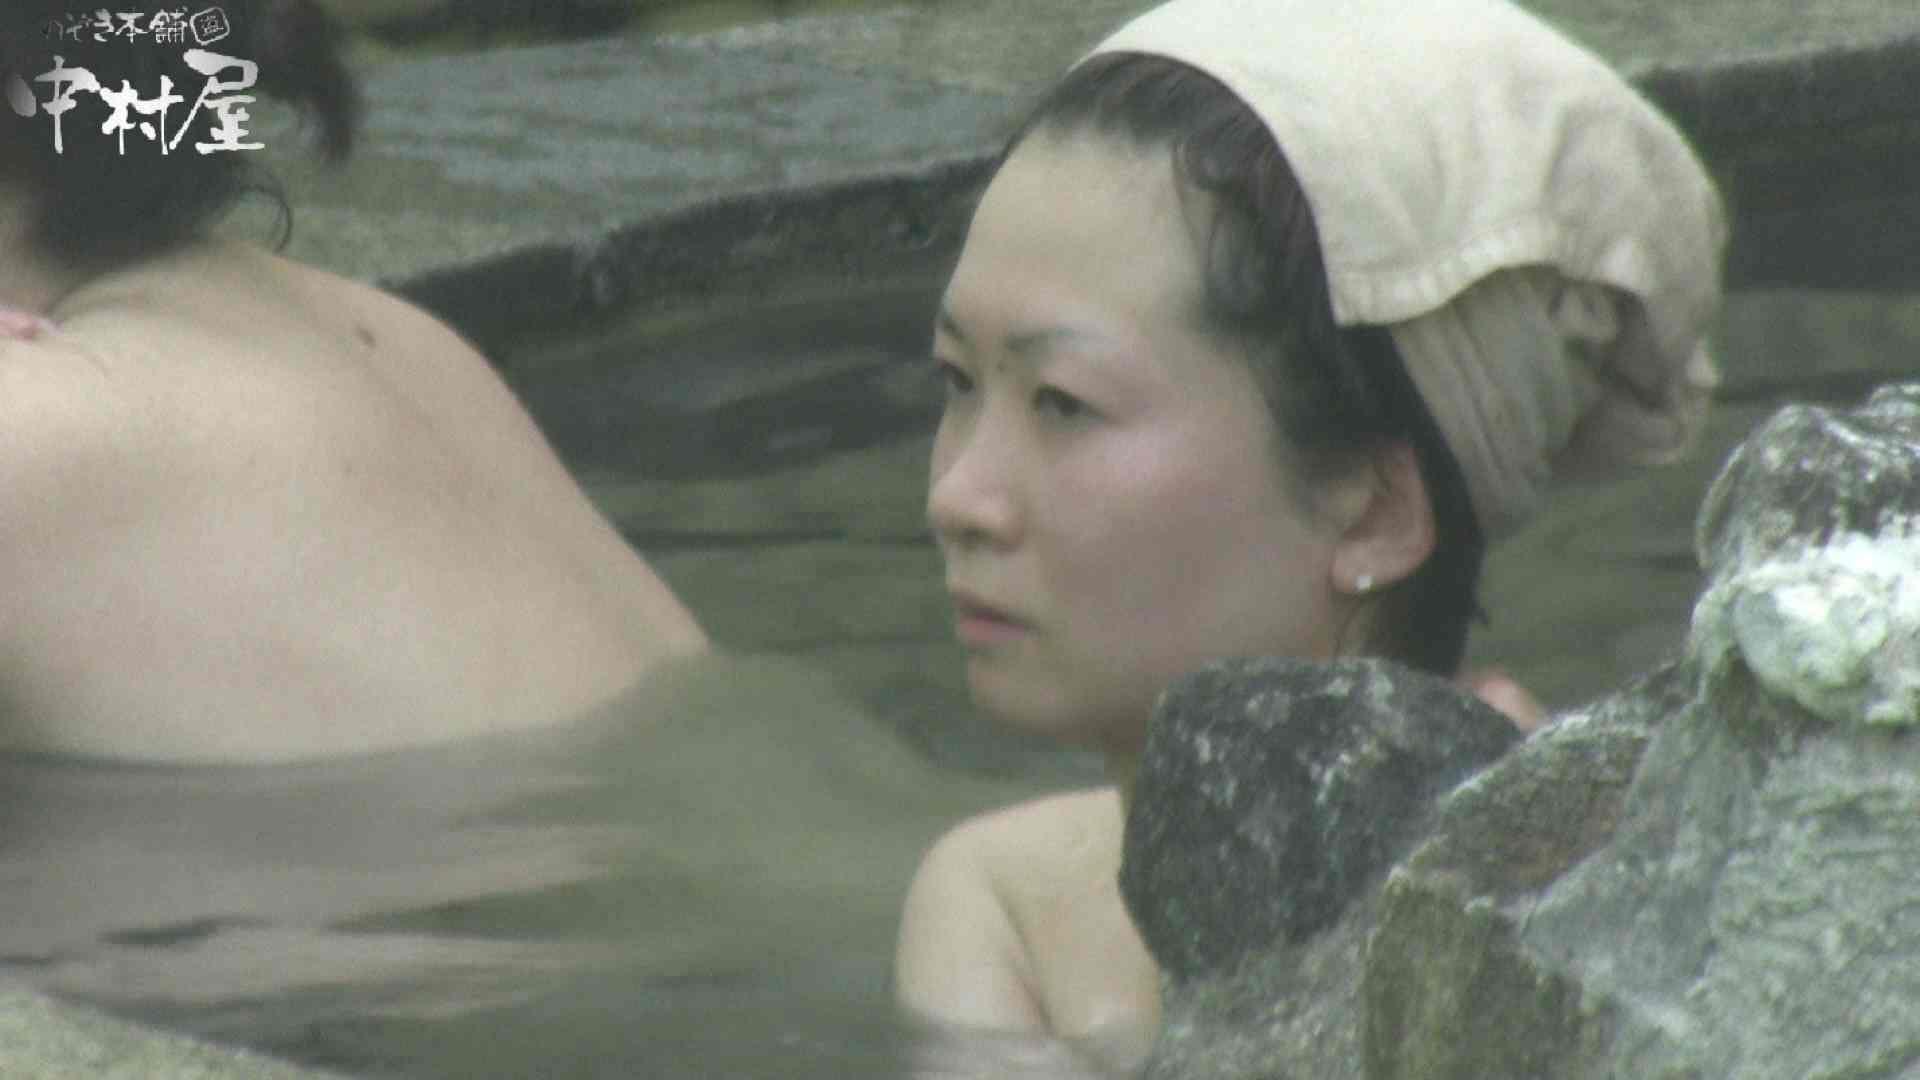 Aquaな露天風呂Vol.906 露天風呂編  86PIX 80